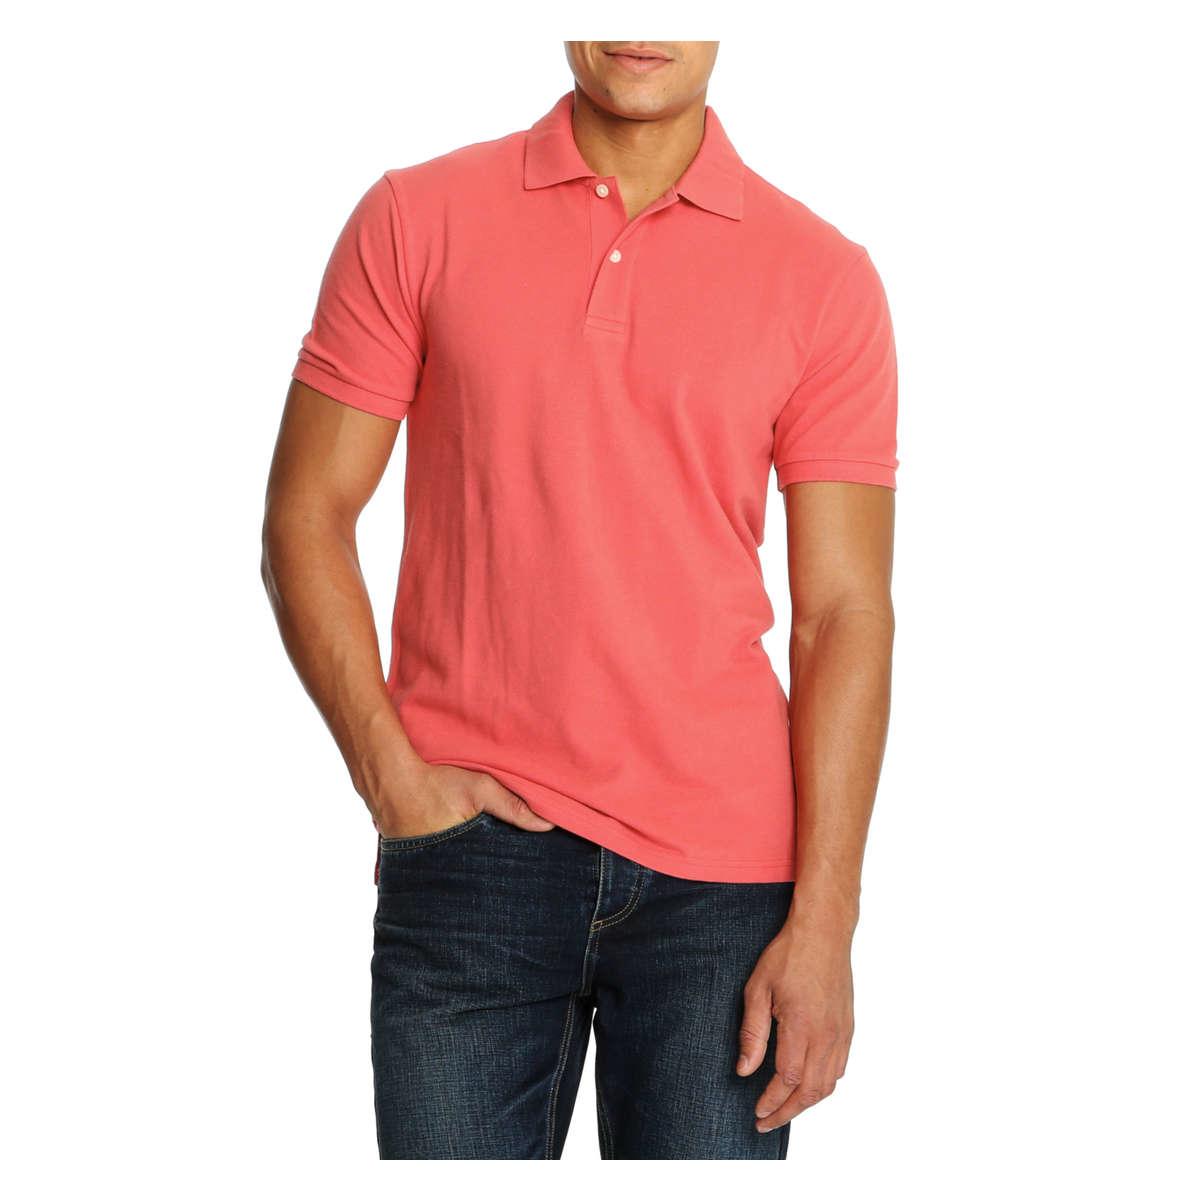 Vivienne Westwood T Shirt Lyst Joe Fresh Men S Classic Polo In Pink For Men